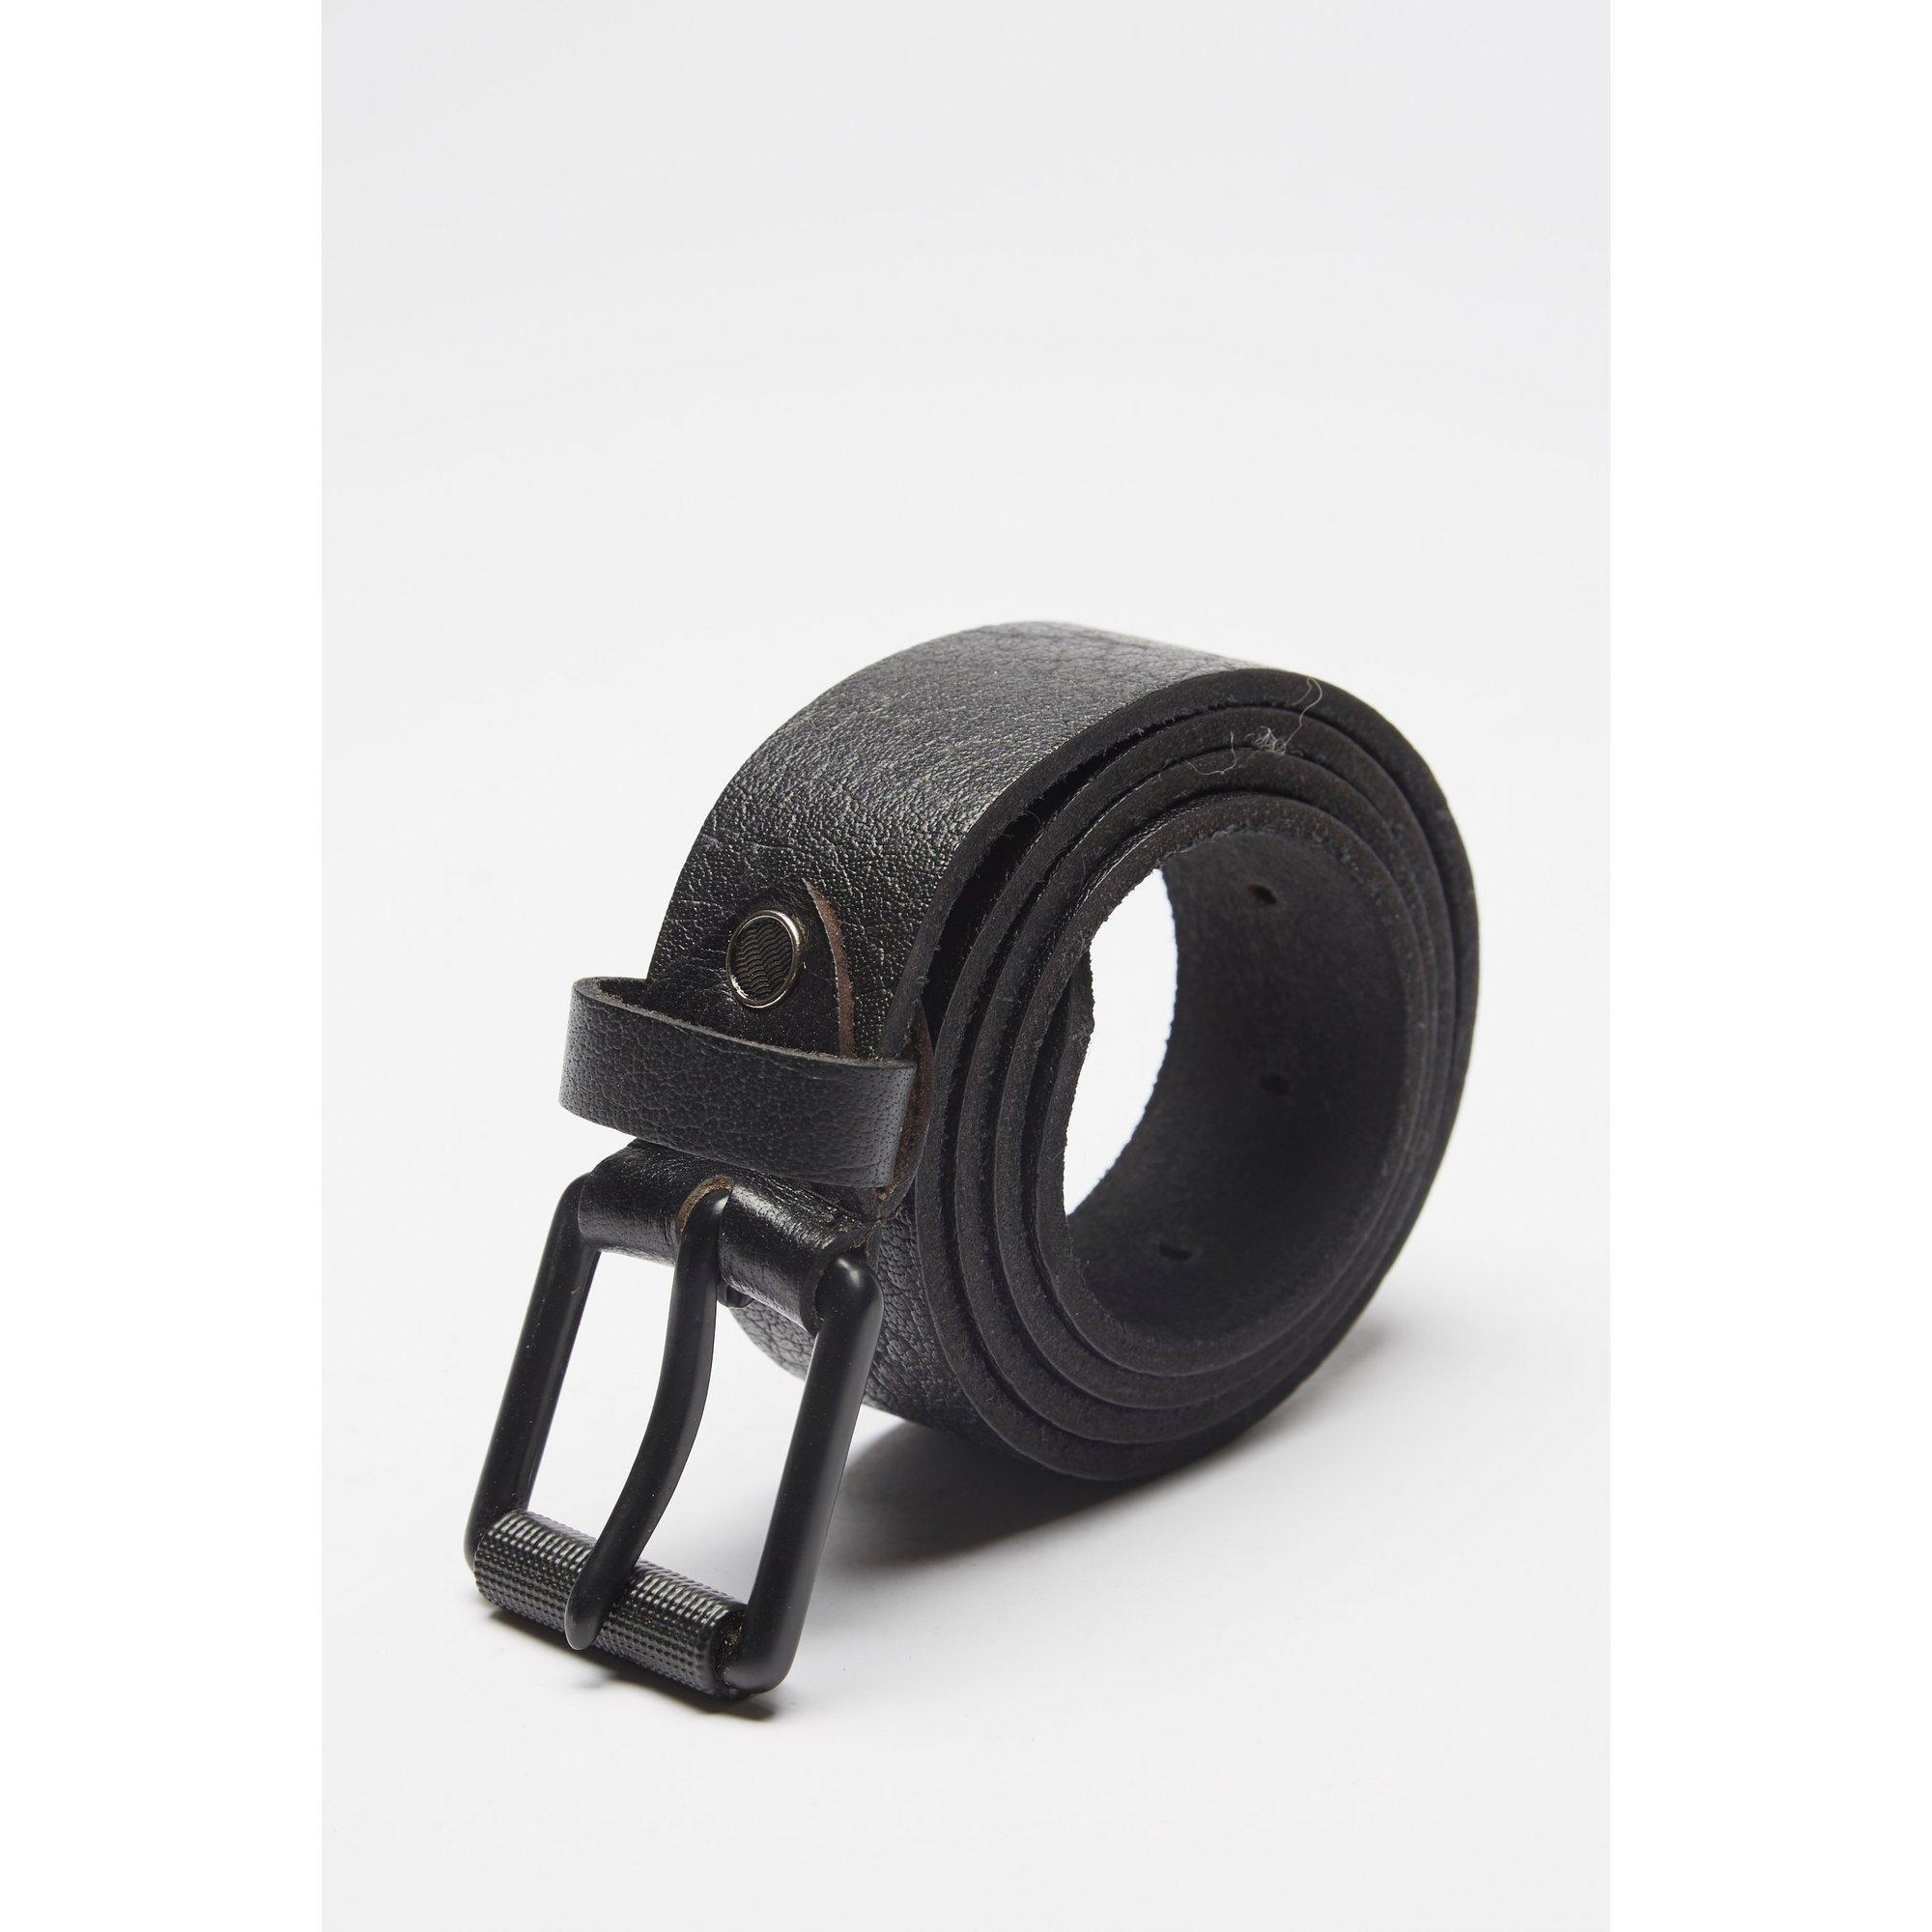 Image of Firelog Leather Roll Top Buckle Belt